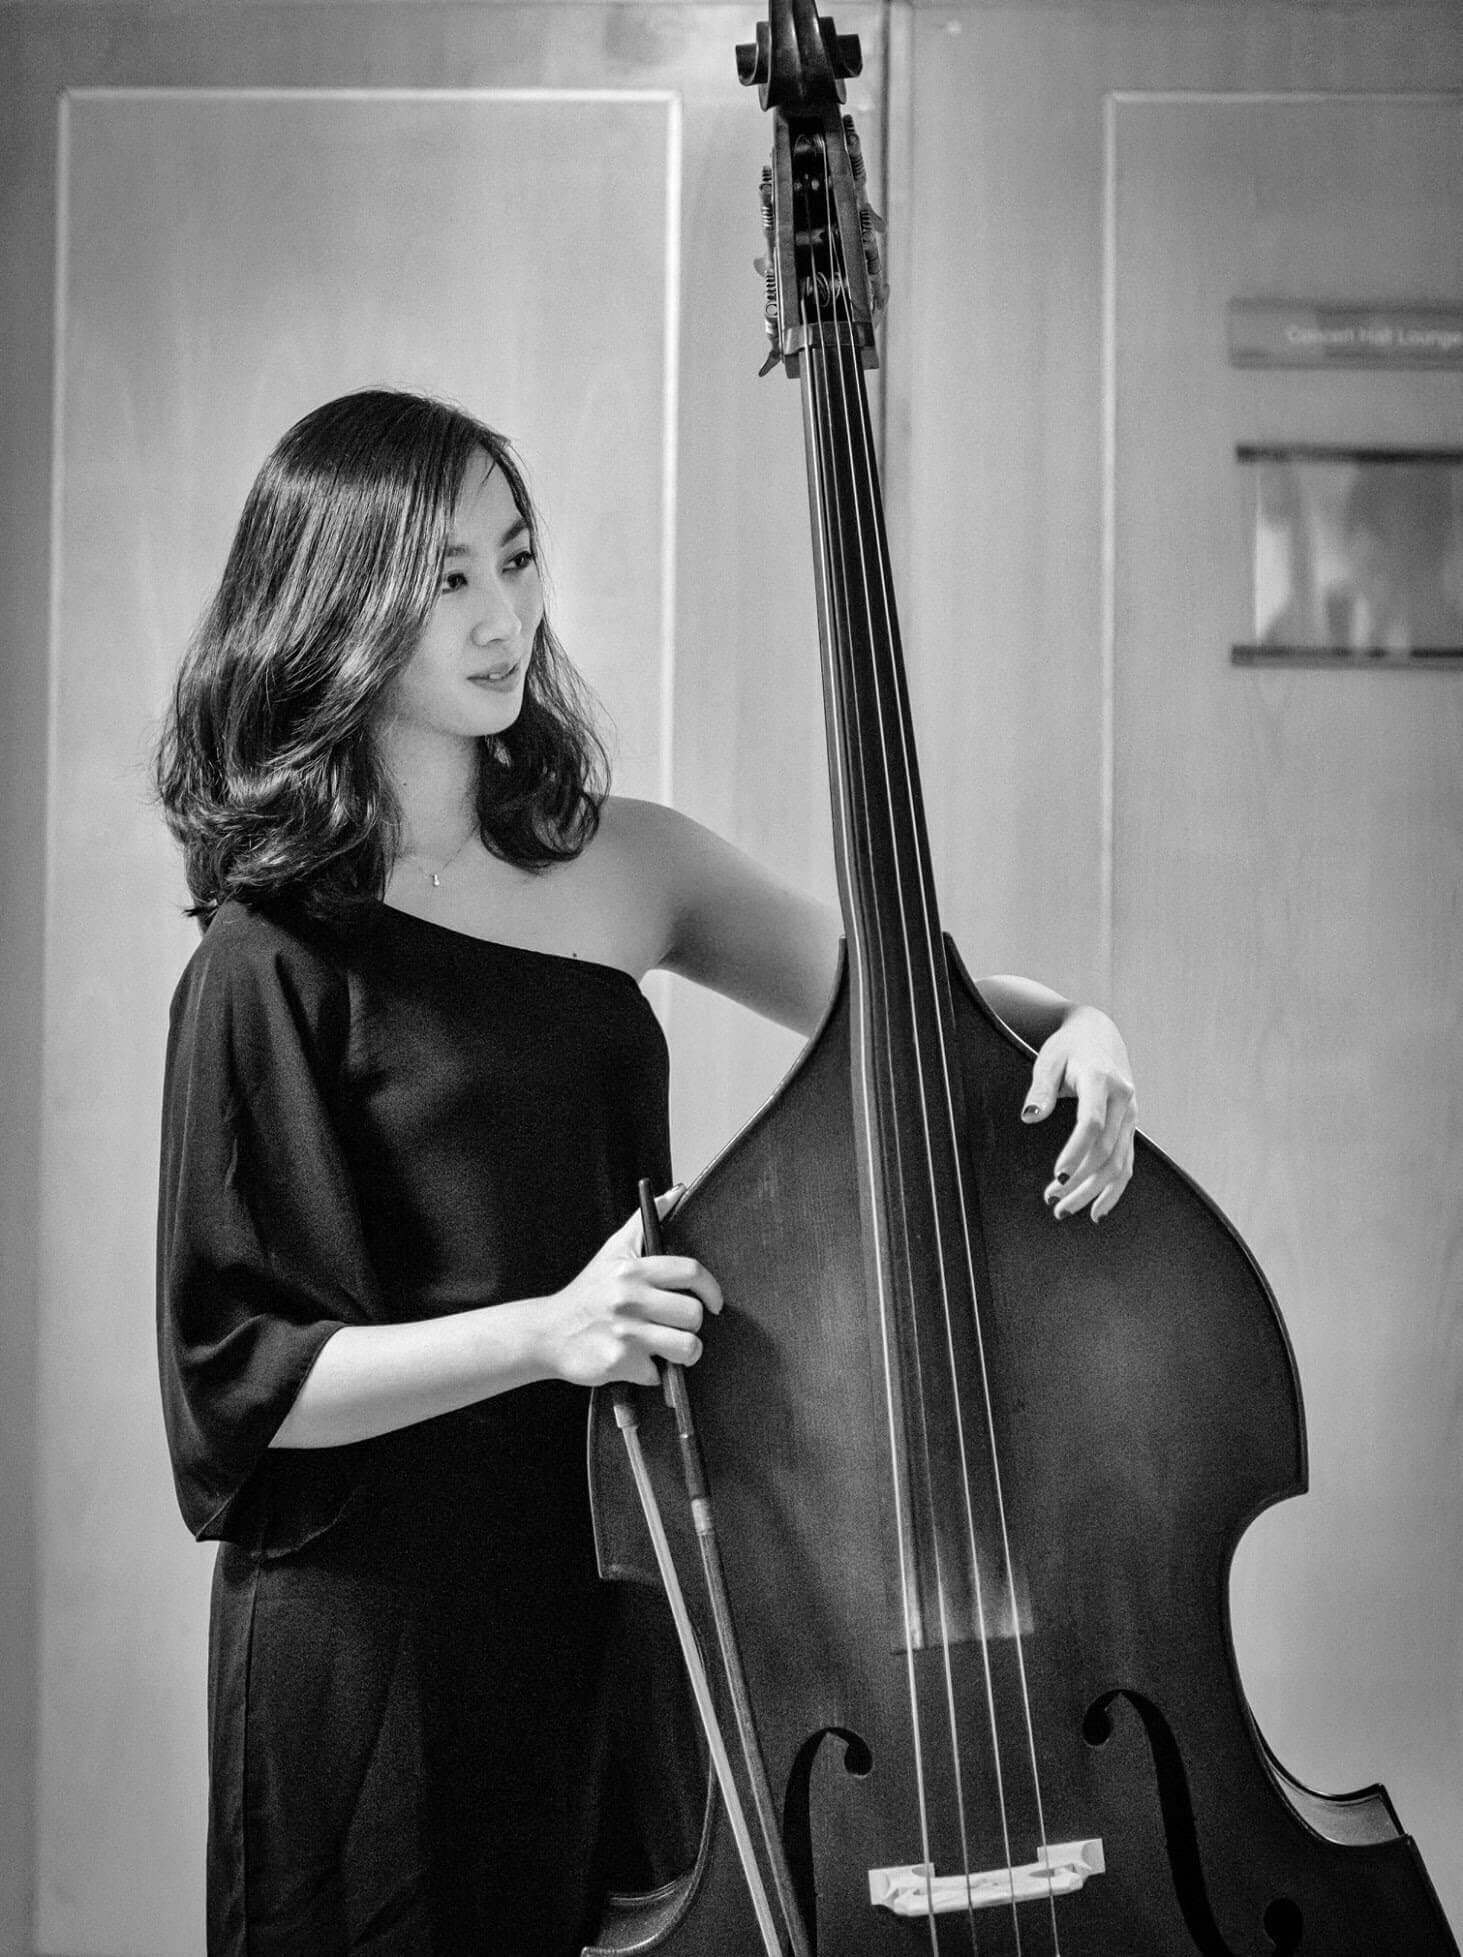 Edwyna Ong